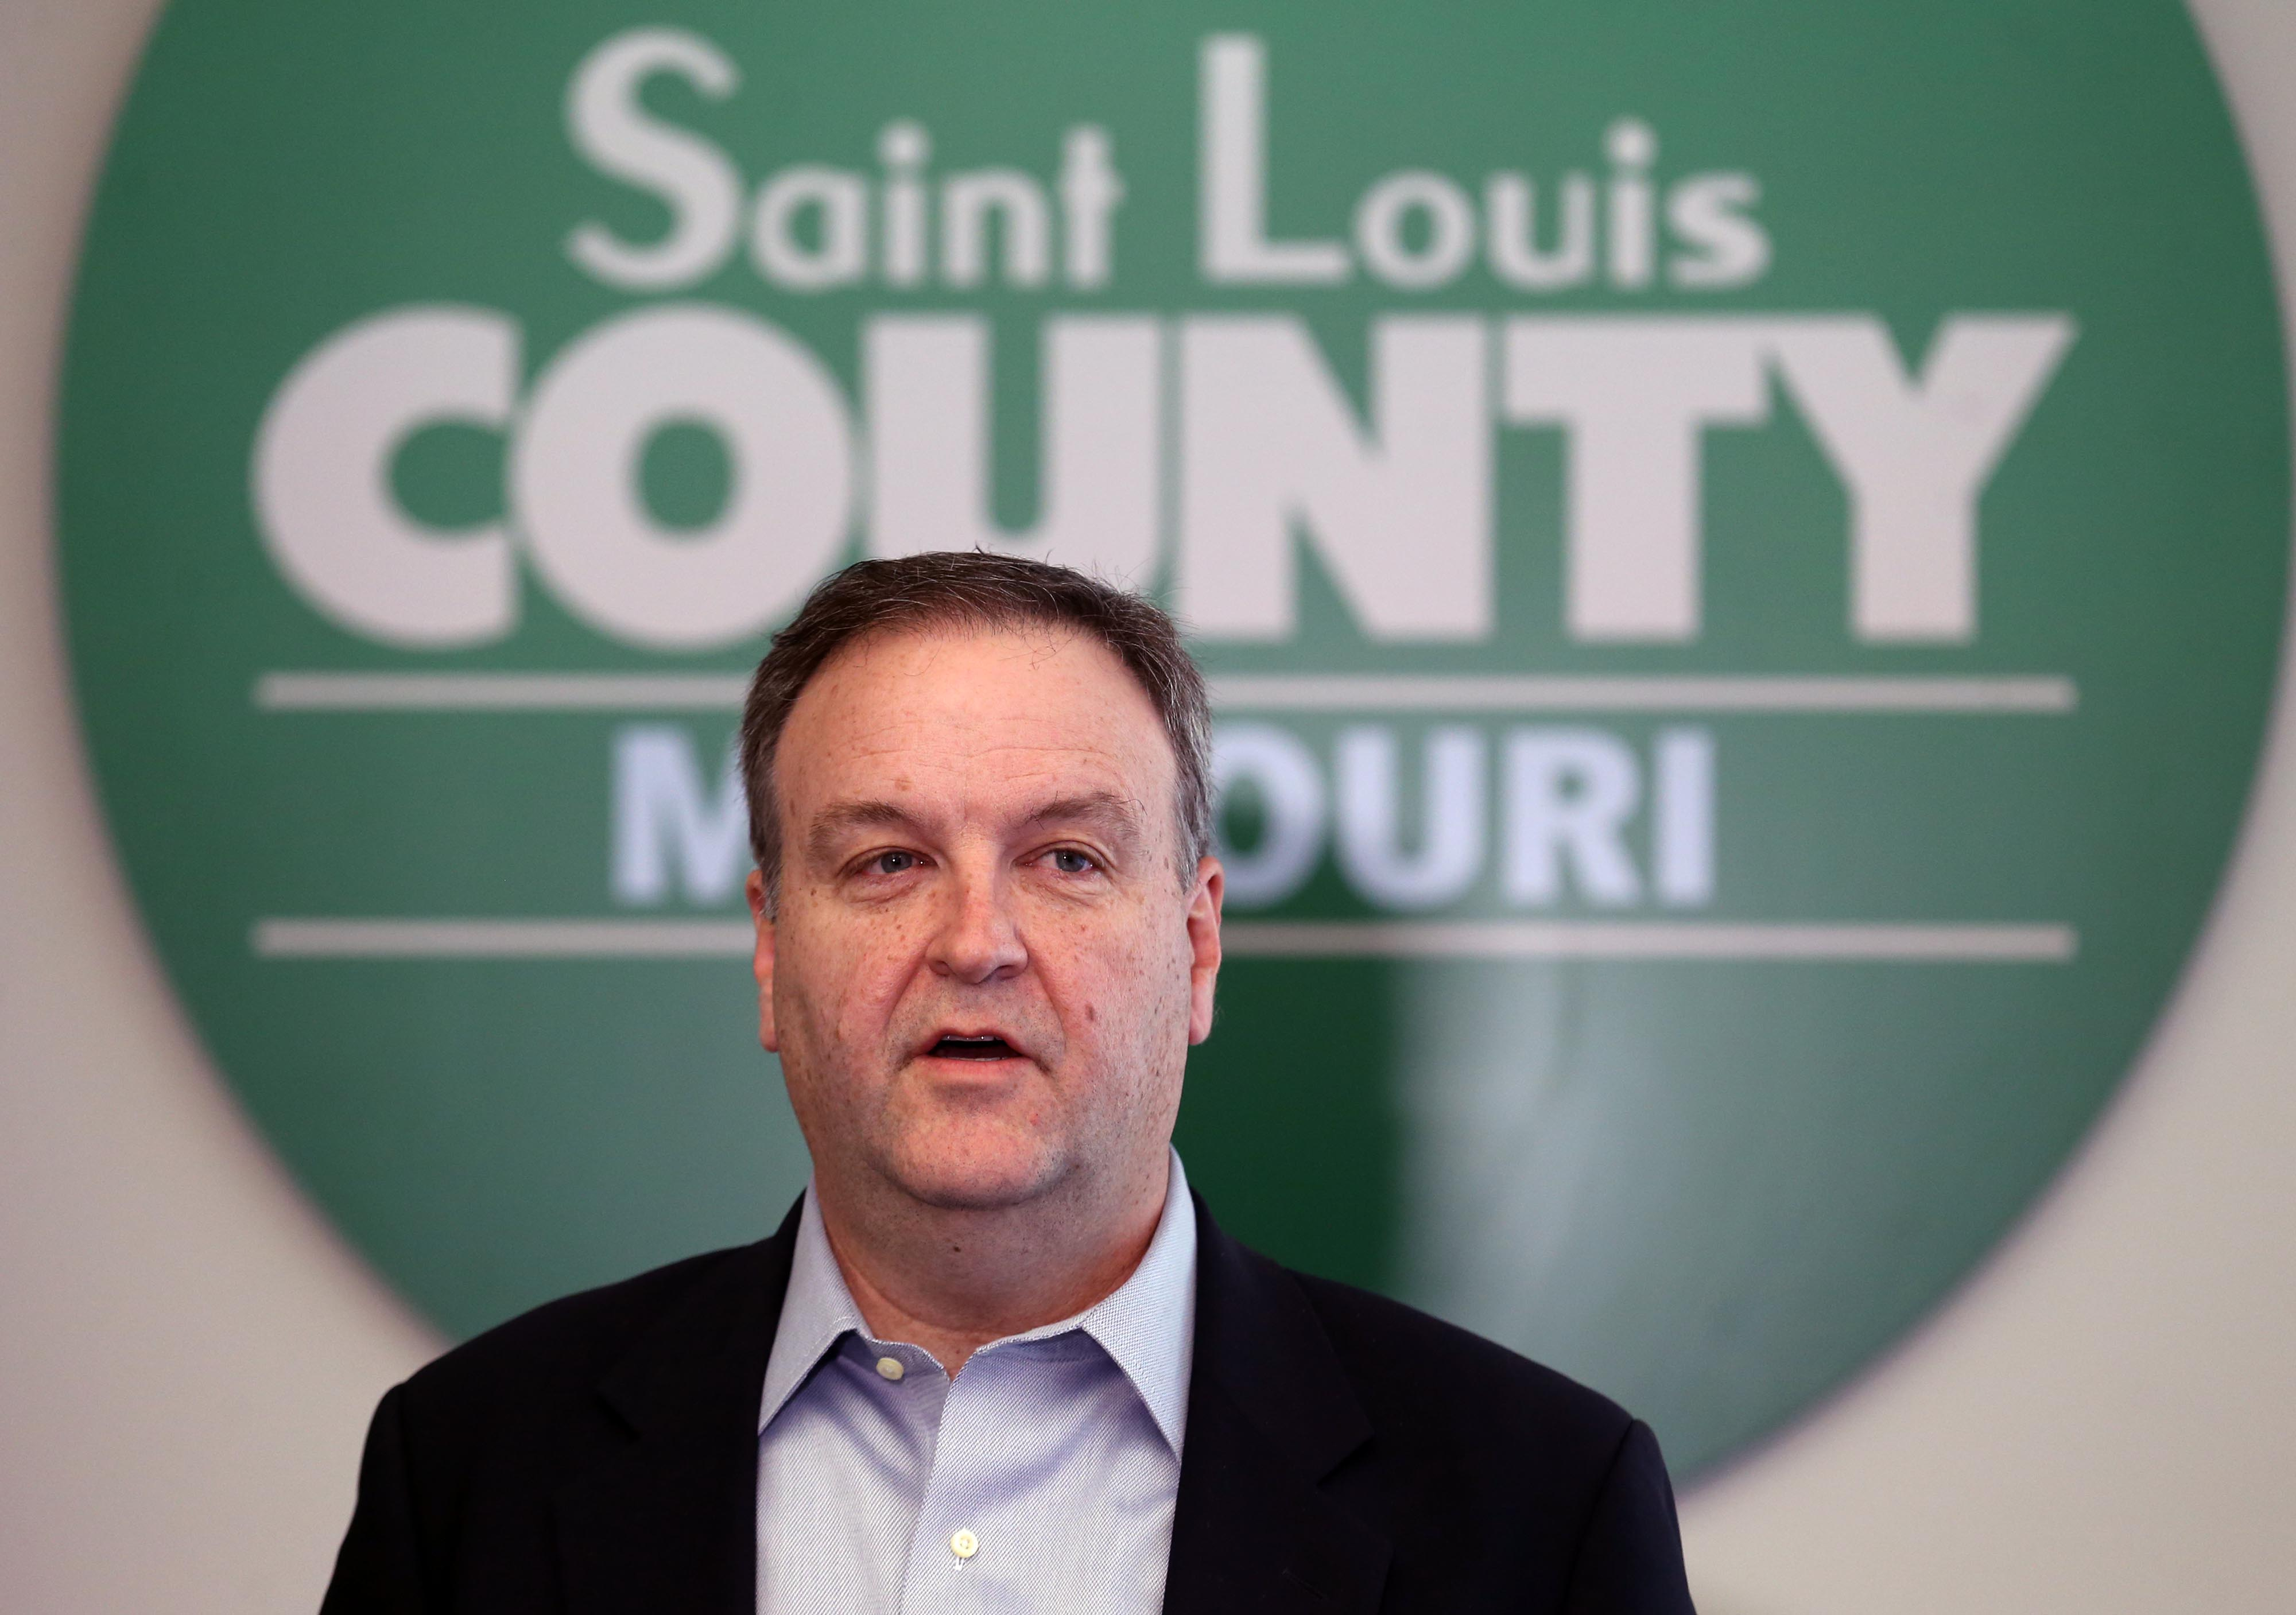 St. Louis County Executive: Focus On Coronavirus Prevention, Not ...